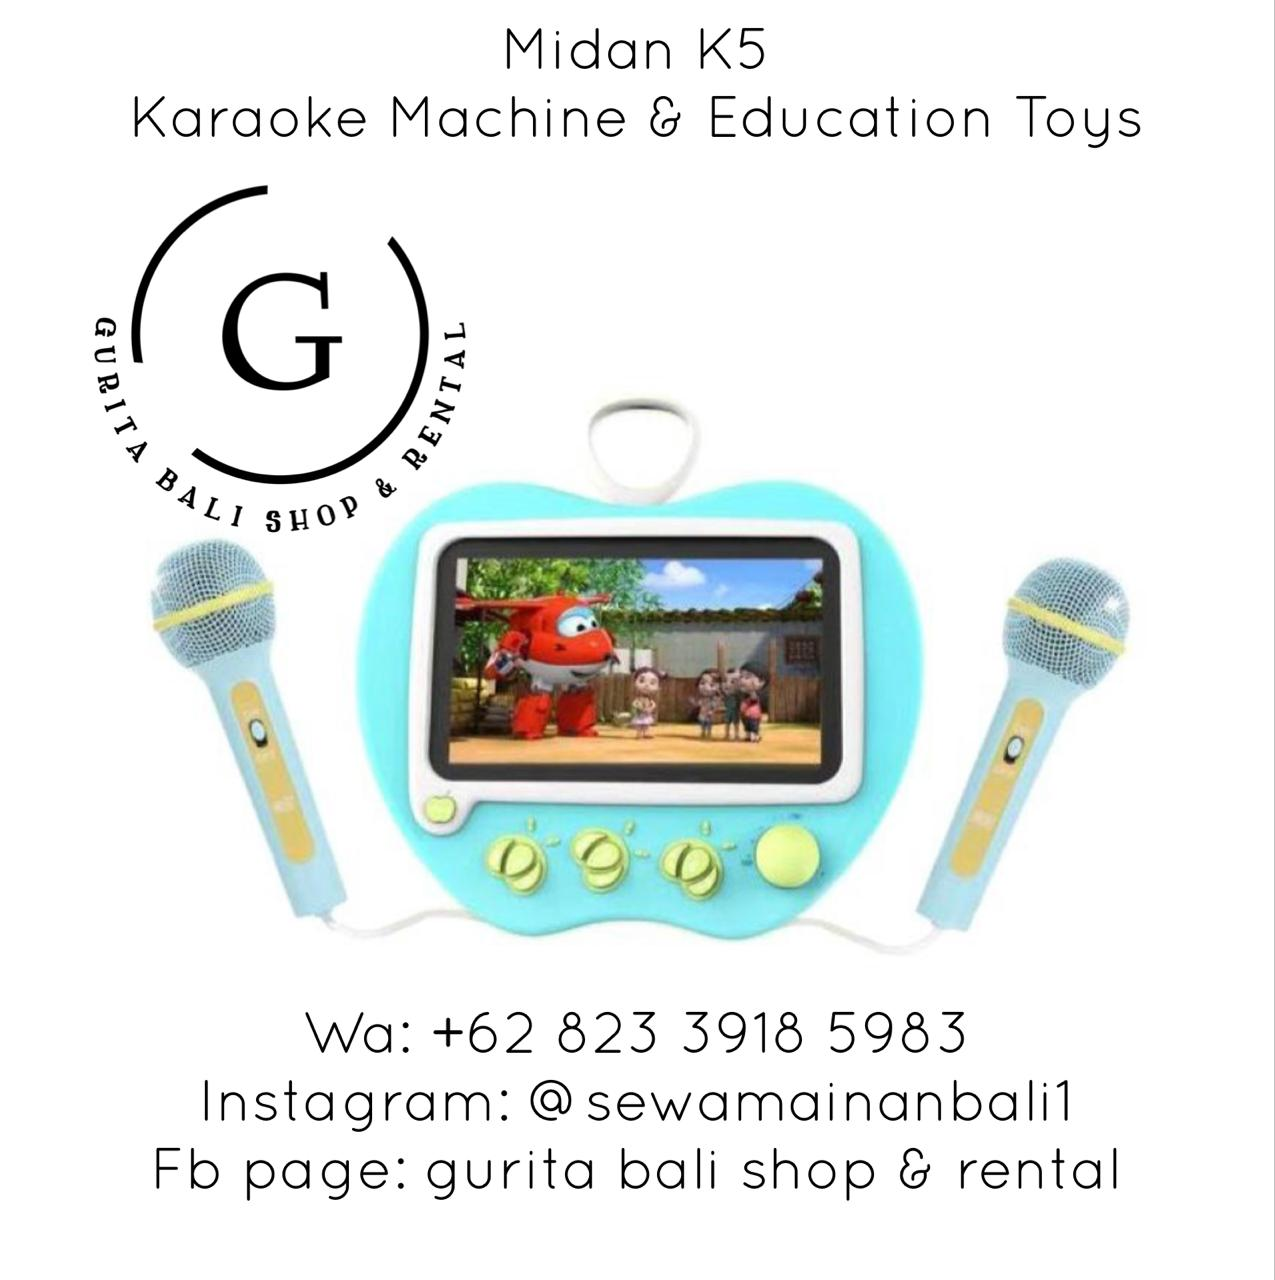 MIDAN K5 KARAOKE MACHINE & EDUCATIONAL